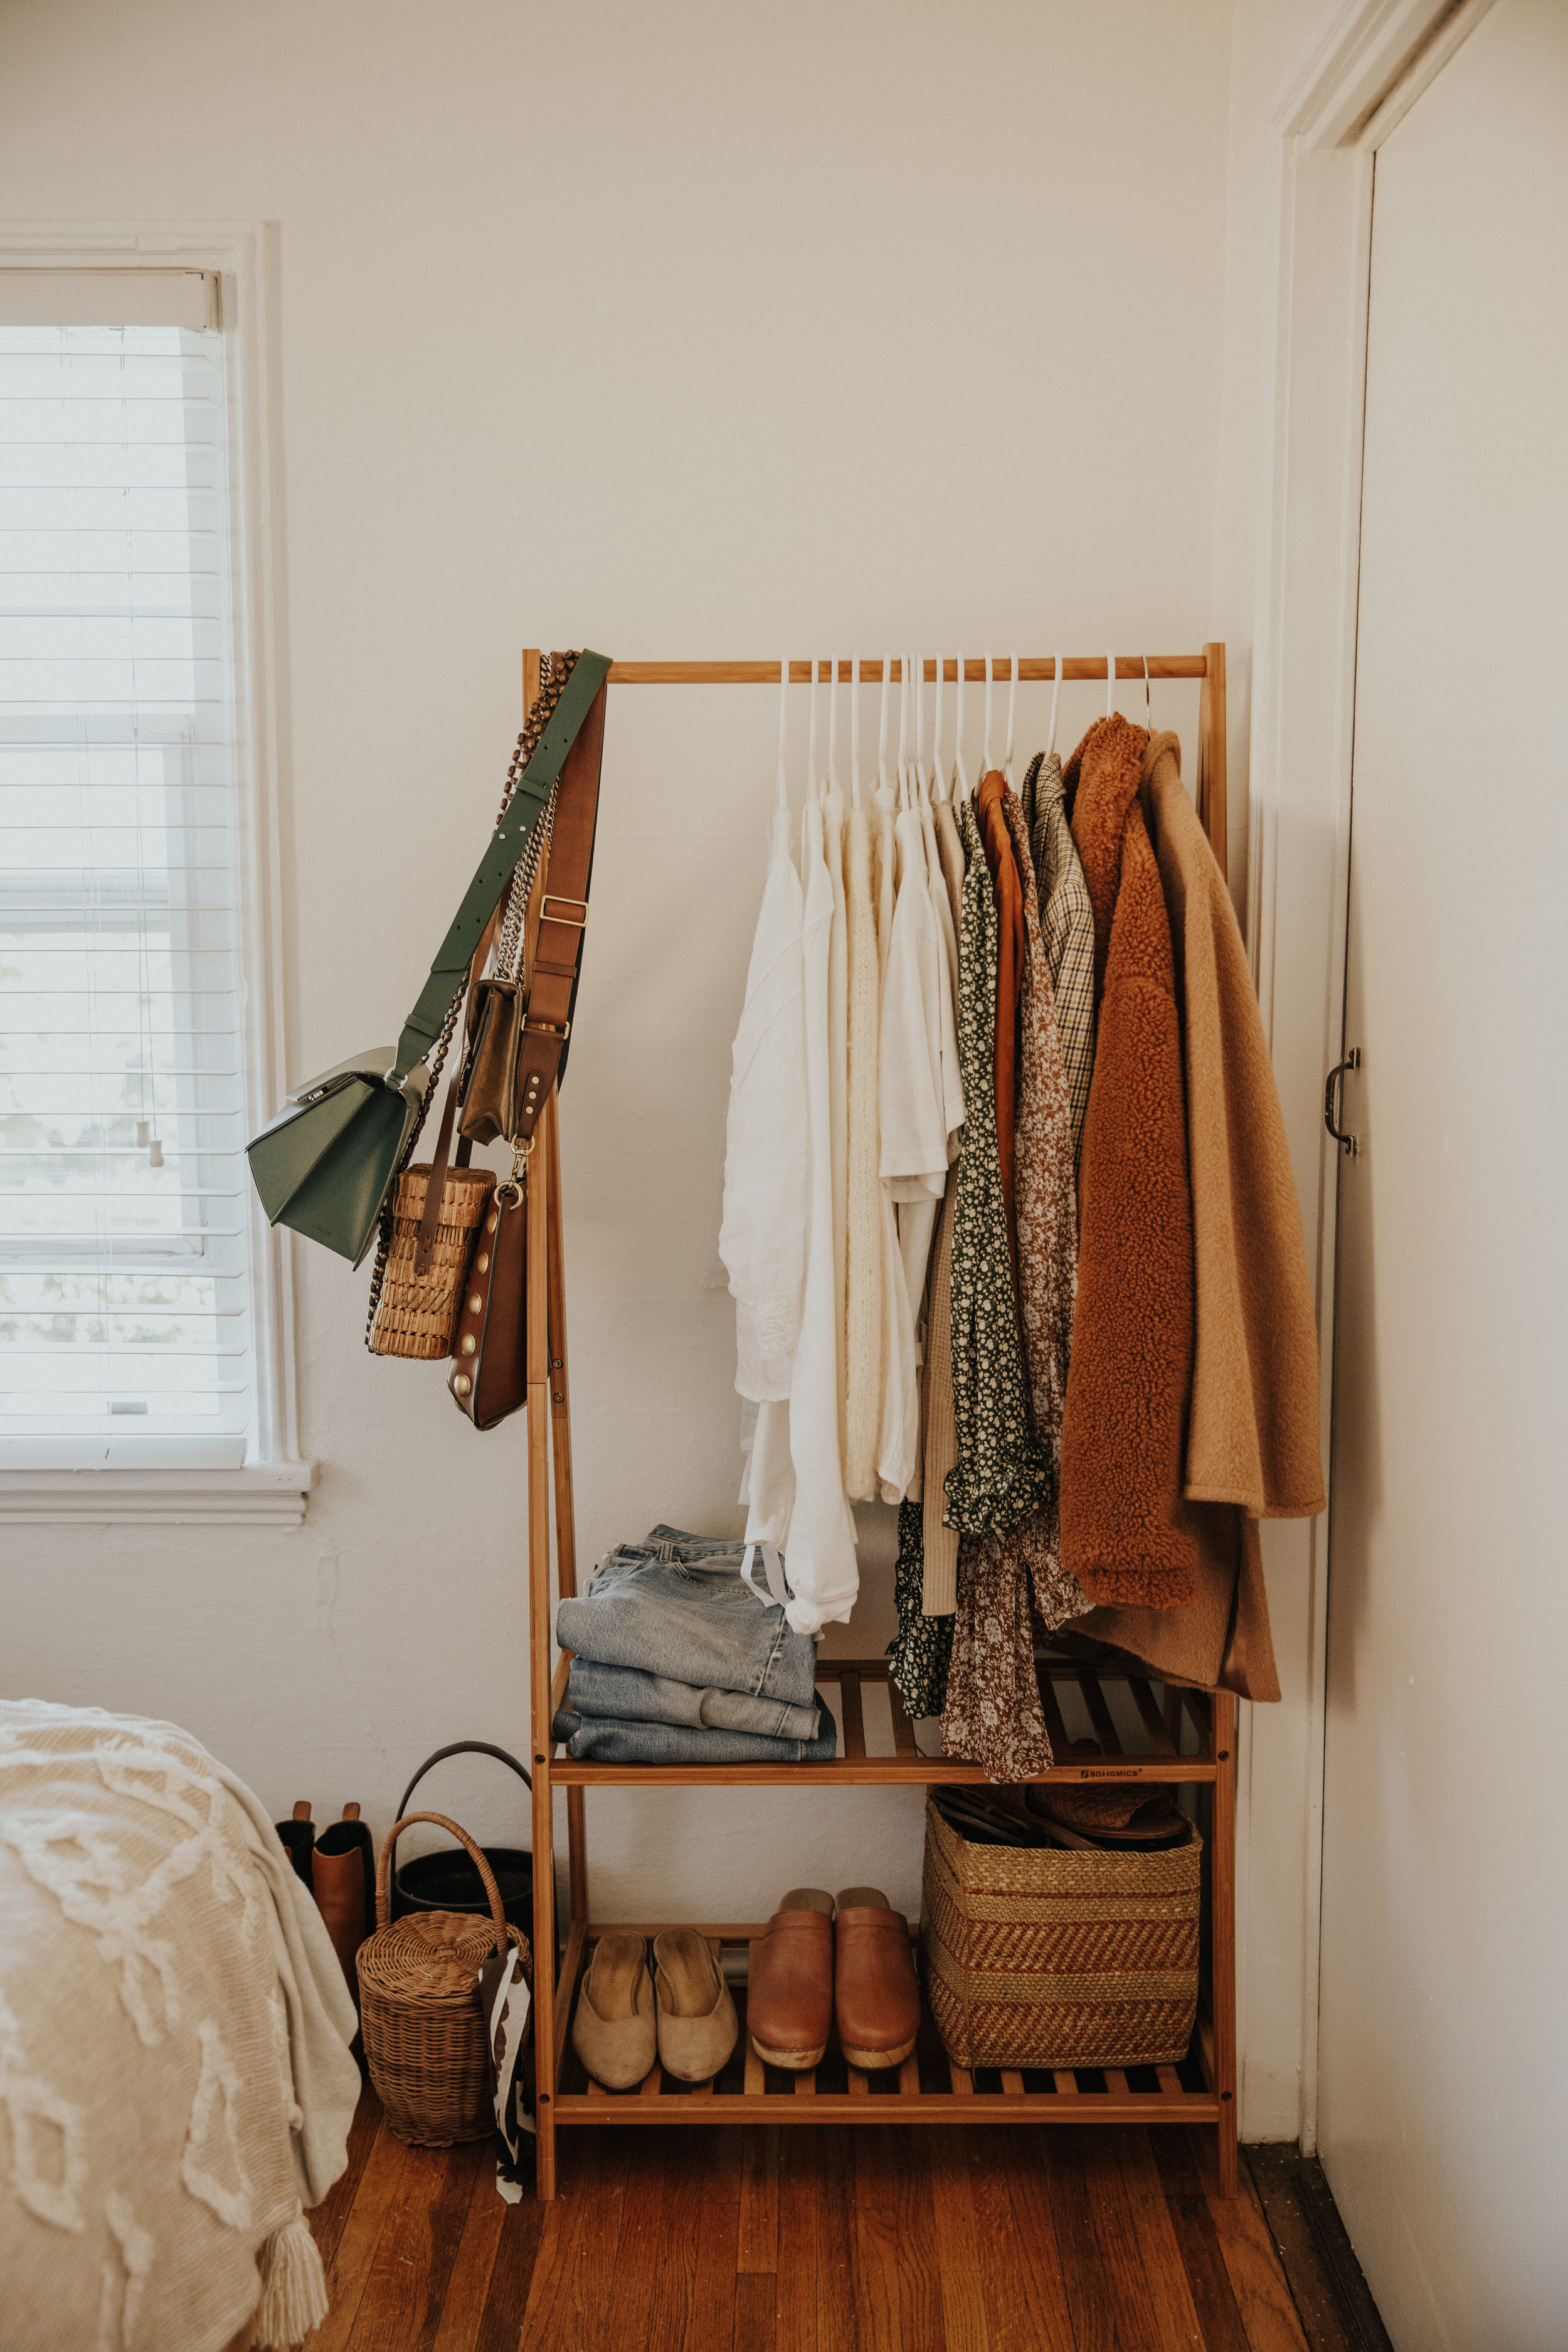 A peak inside Tonya's closet.